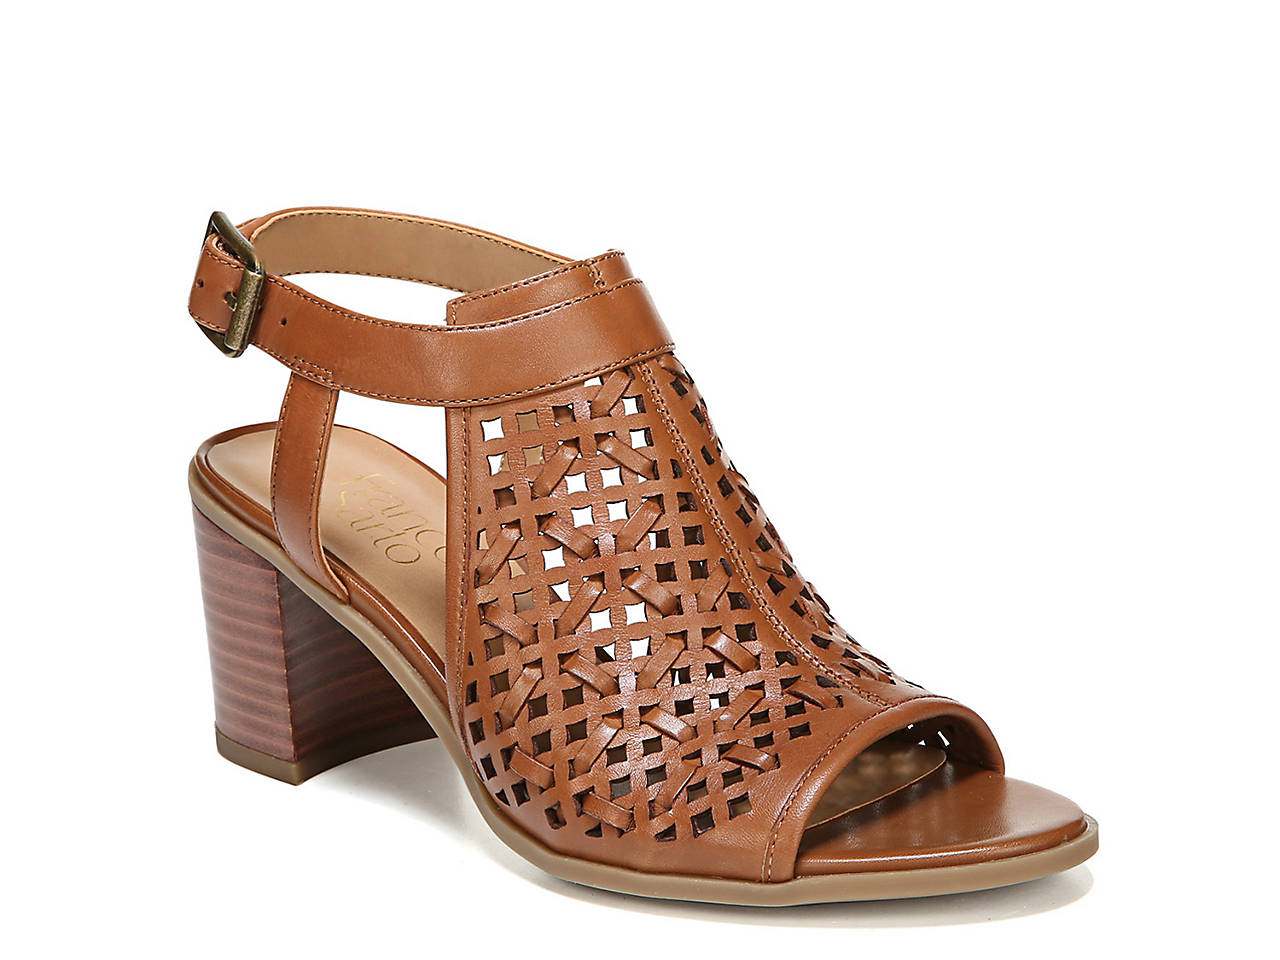 Franco Sarto Harlet Dress Sandal - WOMEN - BROWN LEATHER